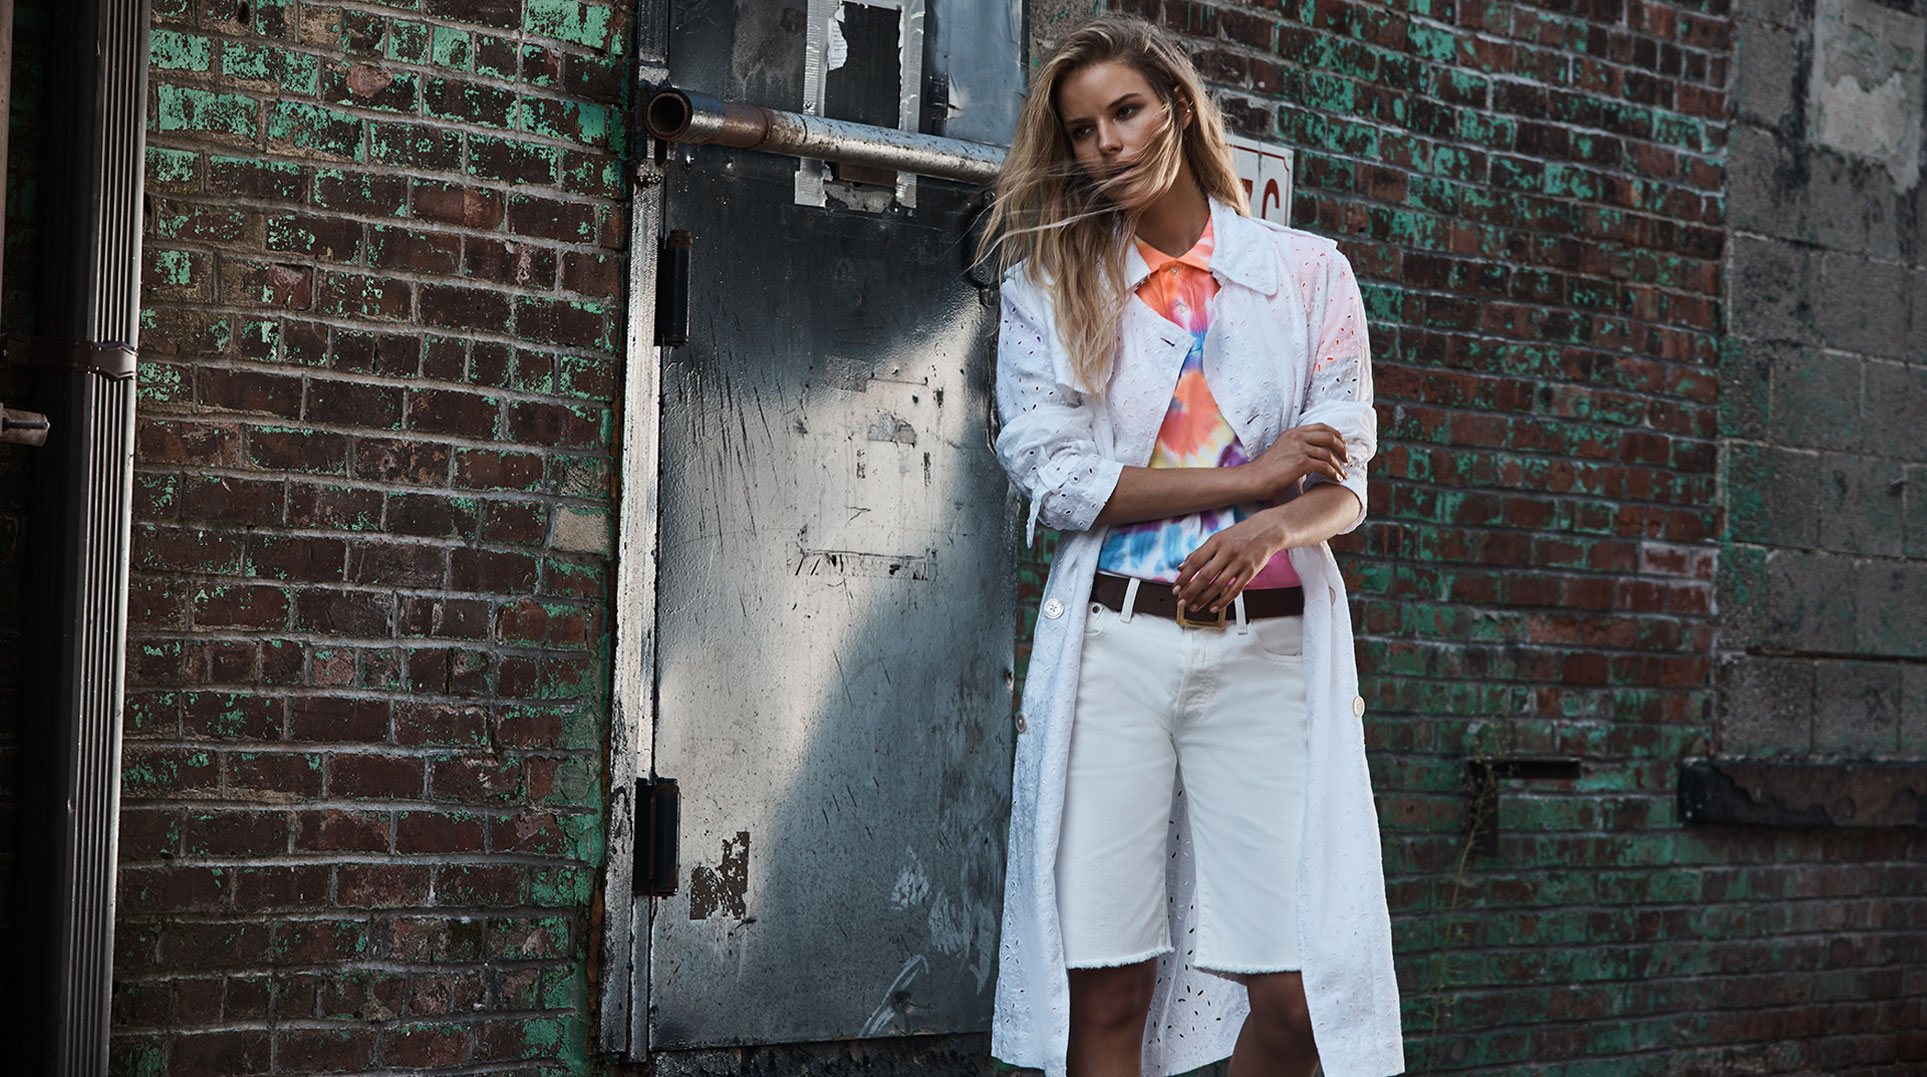 Алена Блум в Нью-Йорке / фото 07